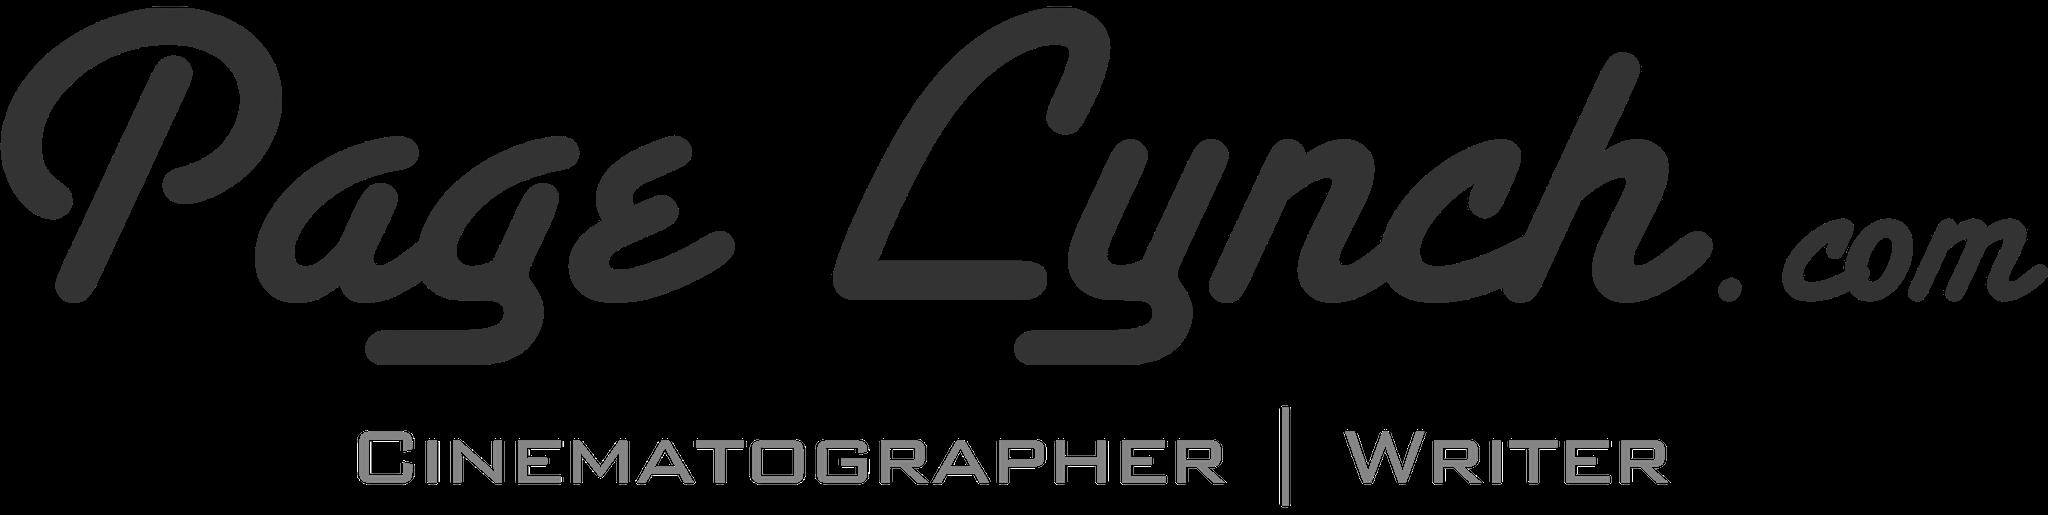 PAGE LYNCH